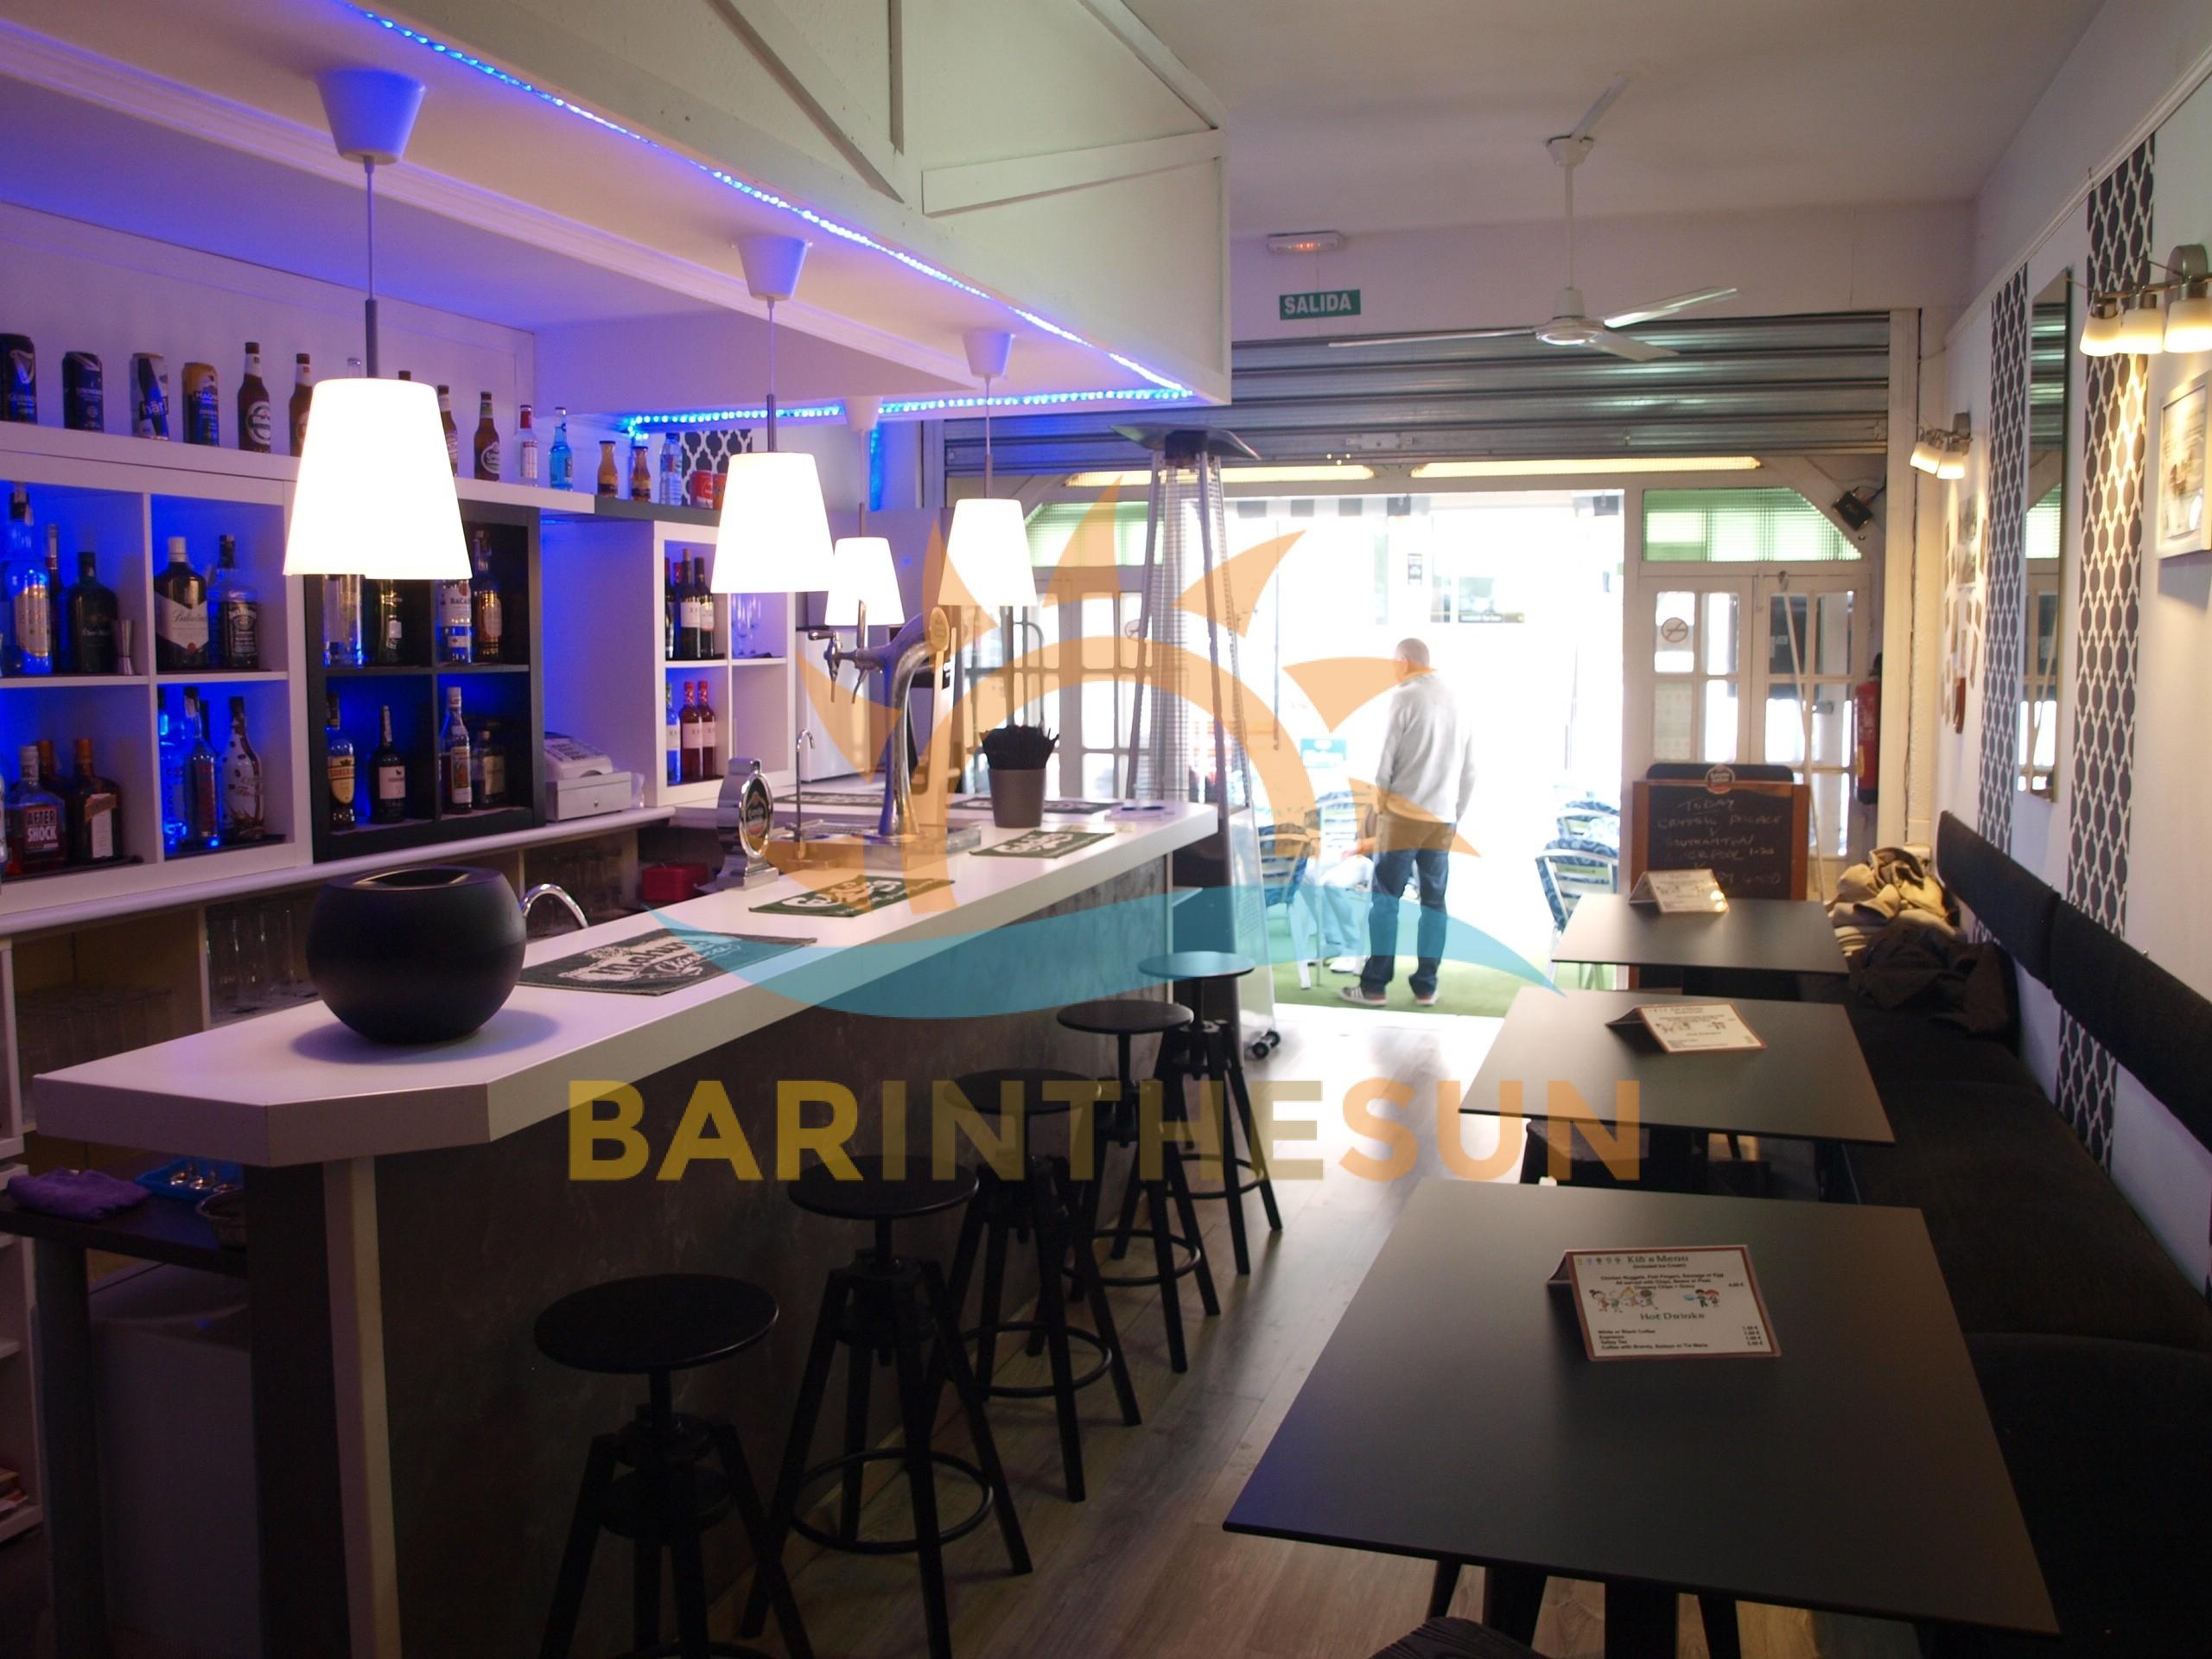 Cafe Bars For Sale in Arroyo De La Miel on The Costa del Sol